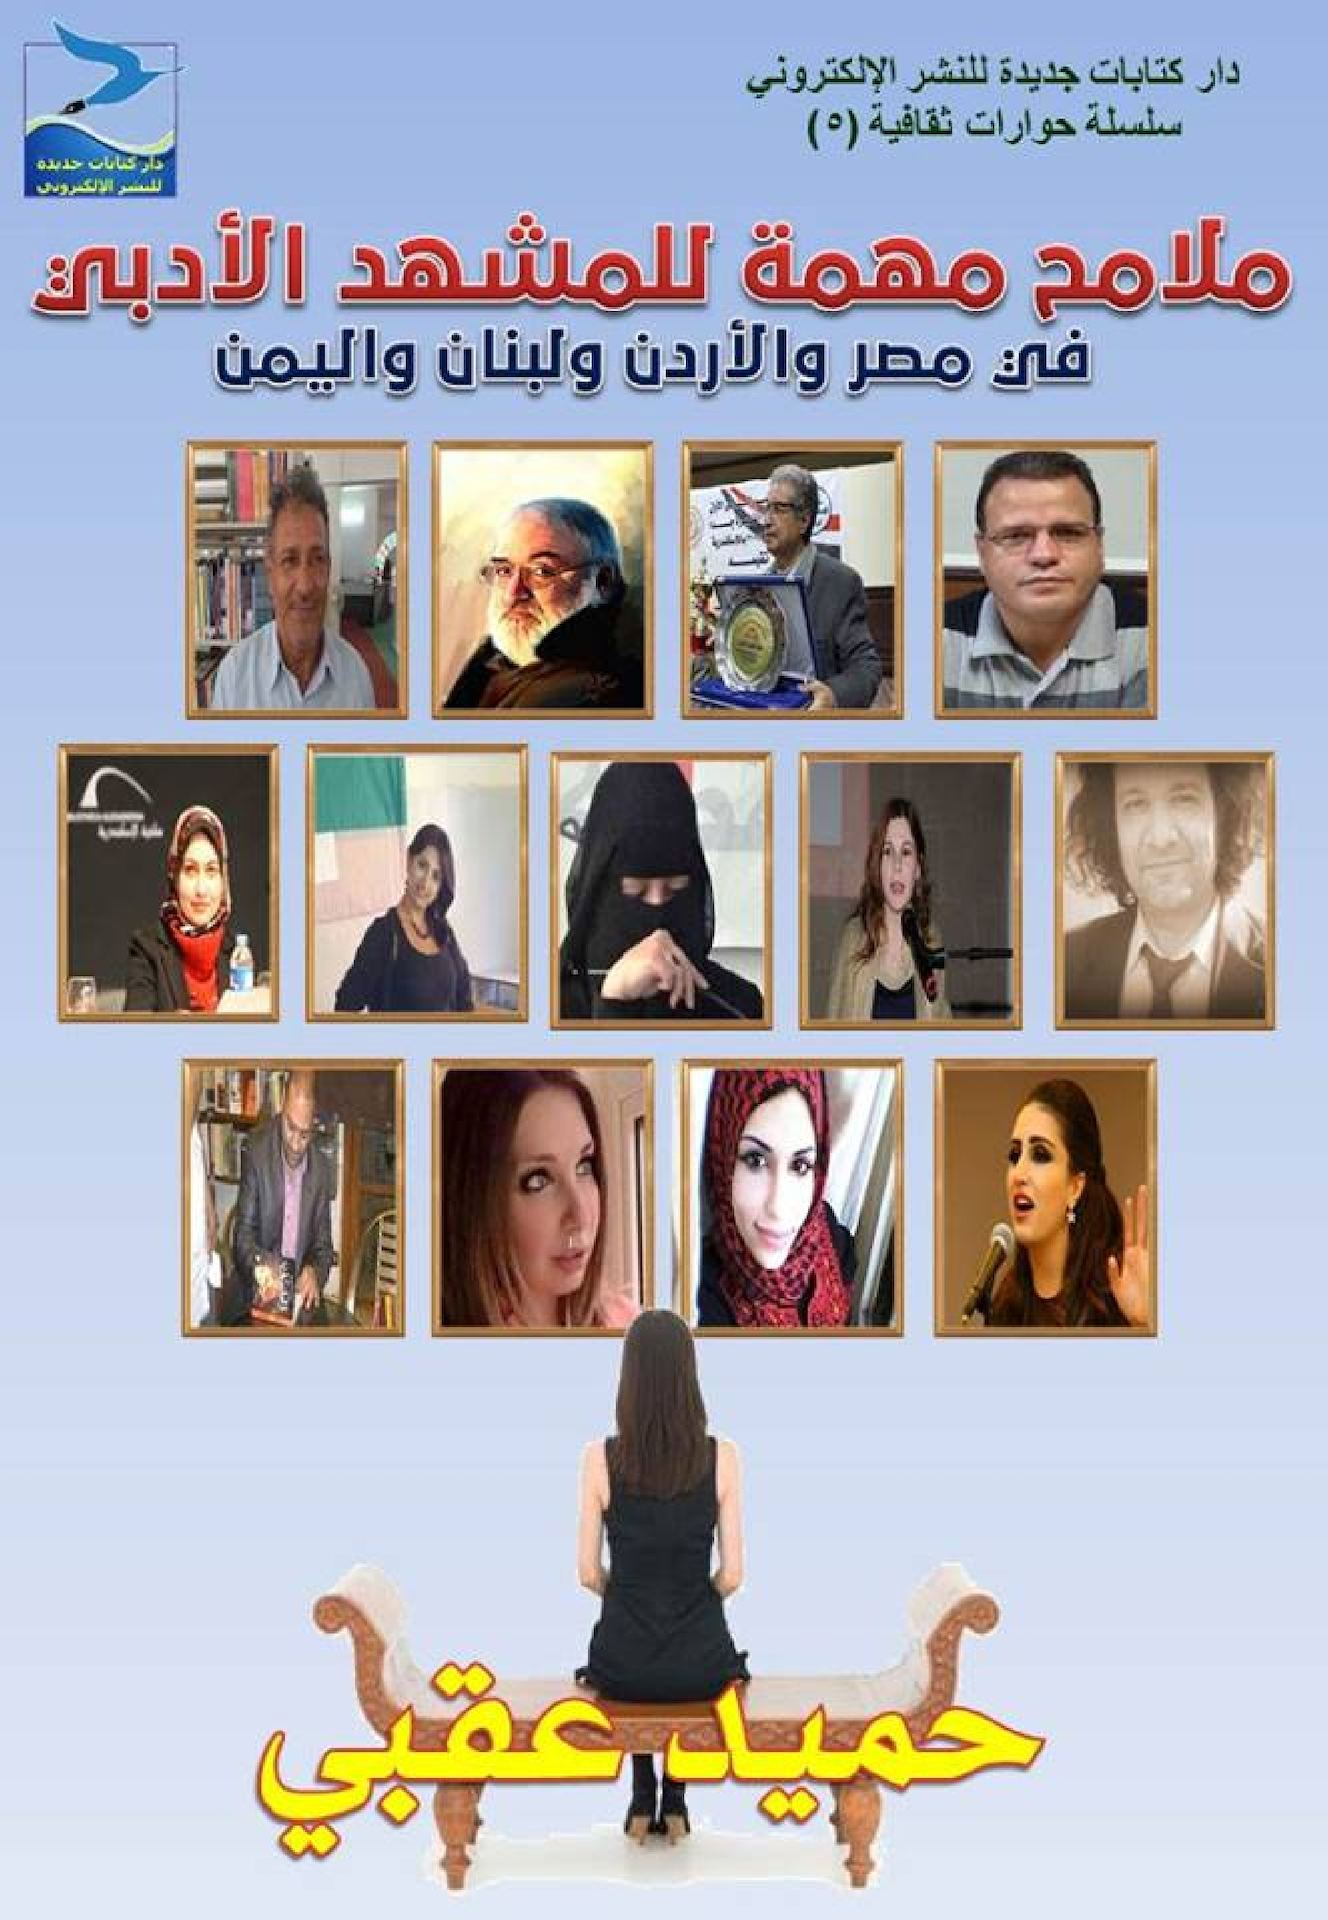 32bb158f4 Calaméo - حميد عقبي، ملامح مهمة للمشهد الأدبي في مصر والأردن ولبنان واليمن،  حوارات، ط1، أبريل 2016